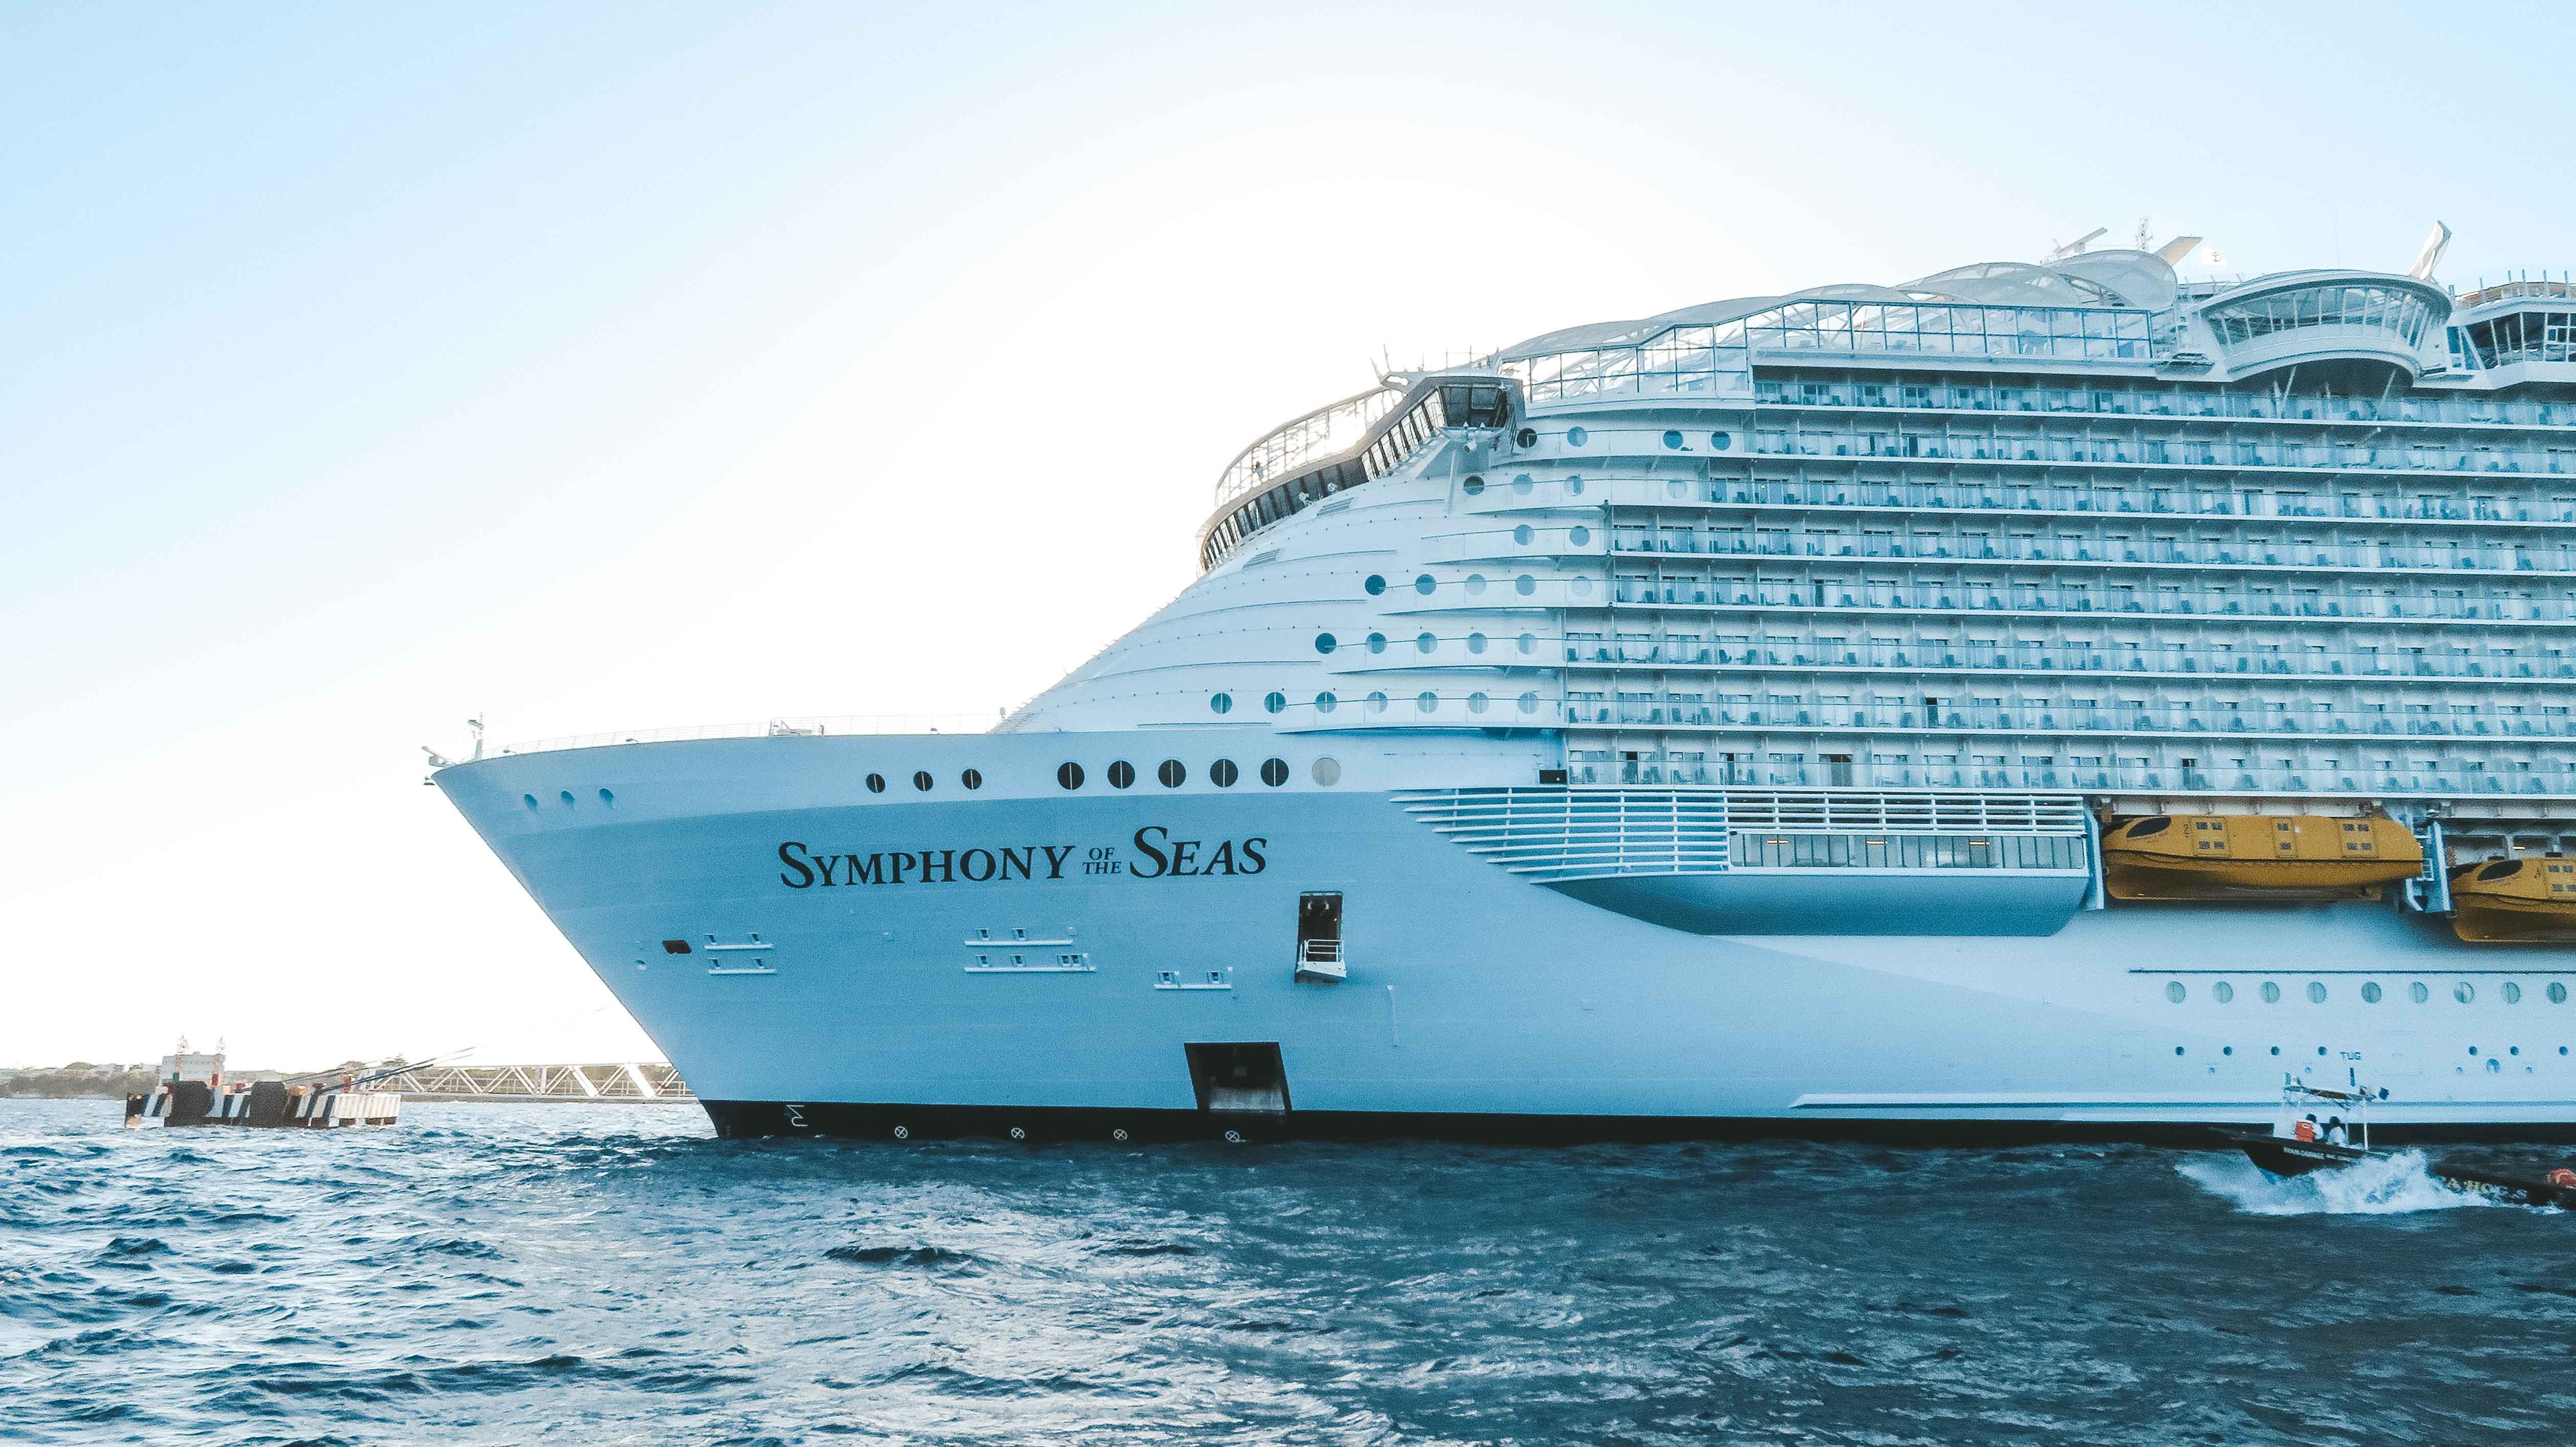 Kreuzfahrt Schiff Symphony of the seas